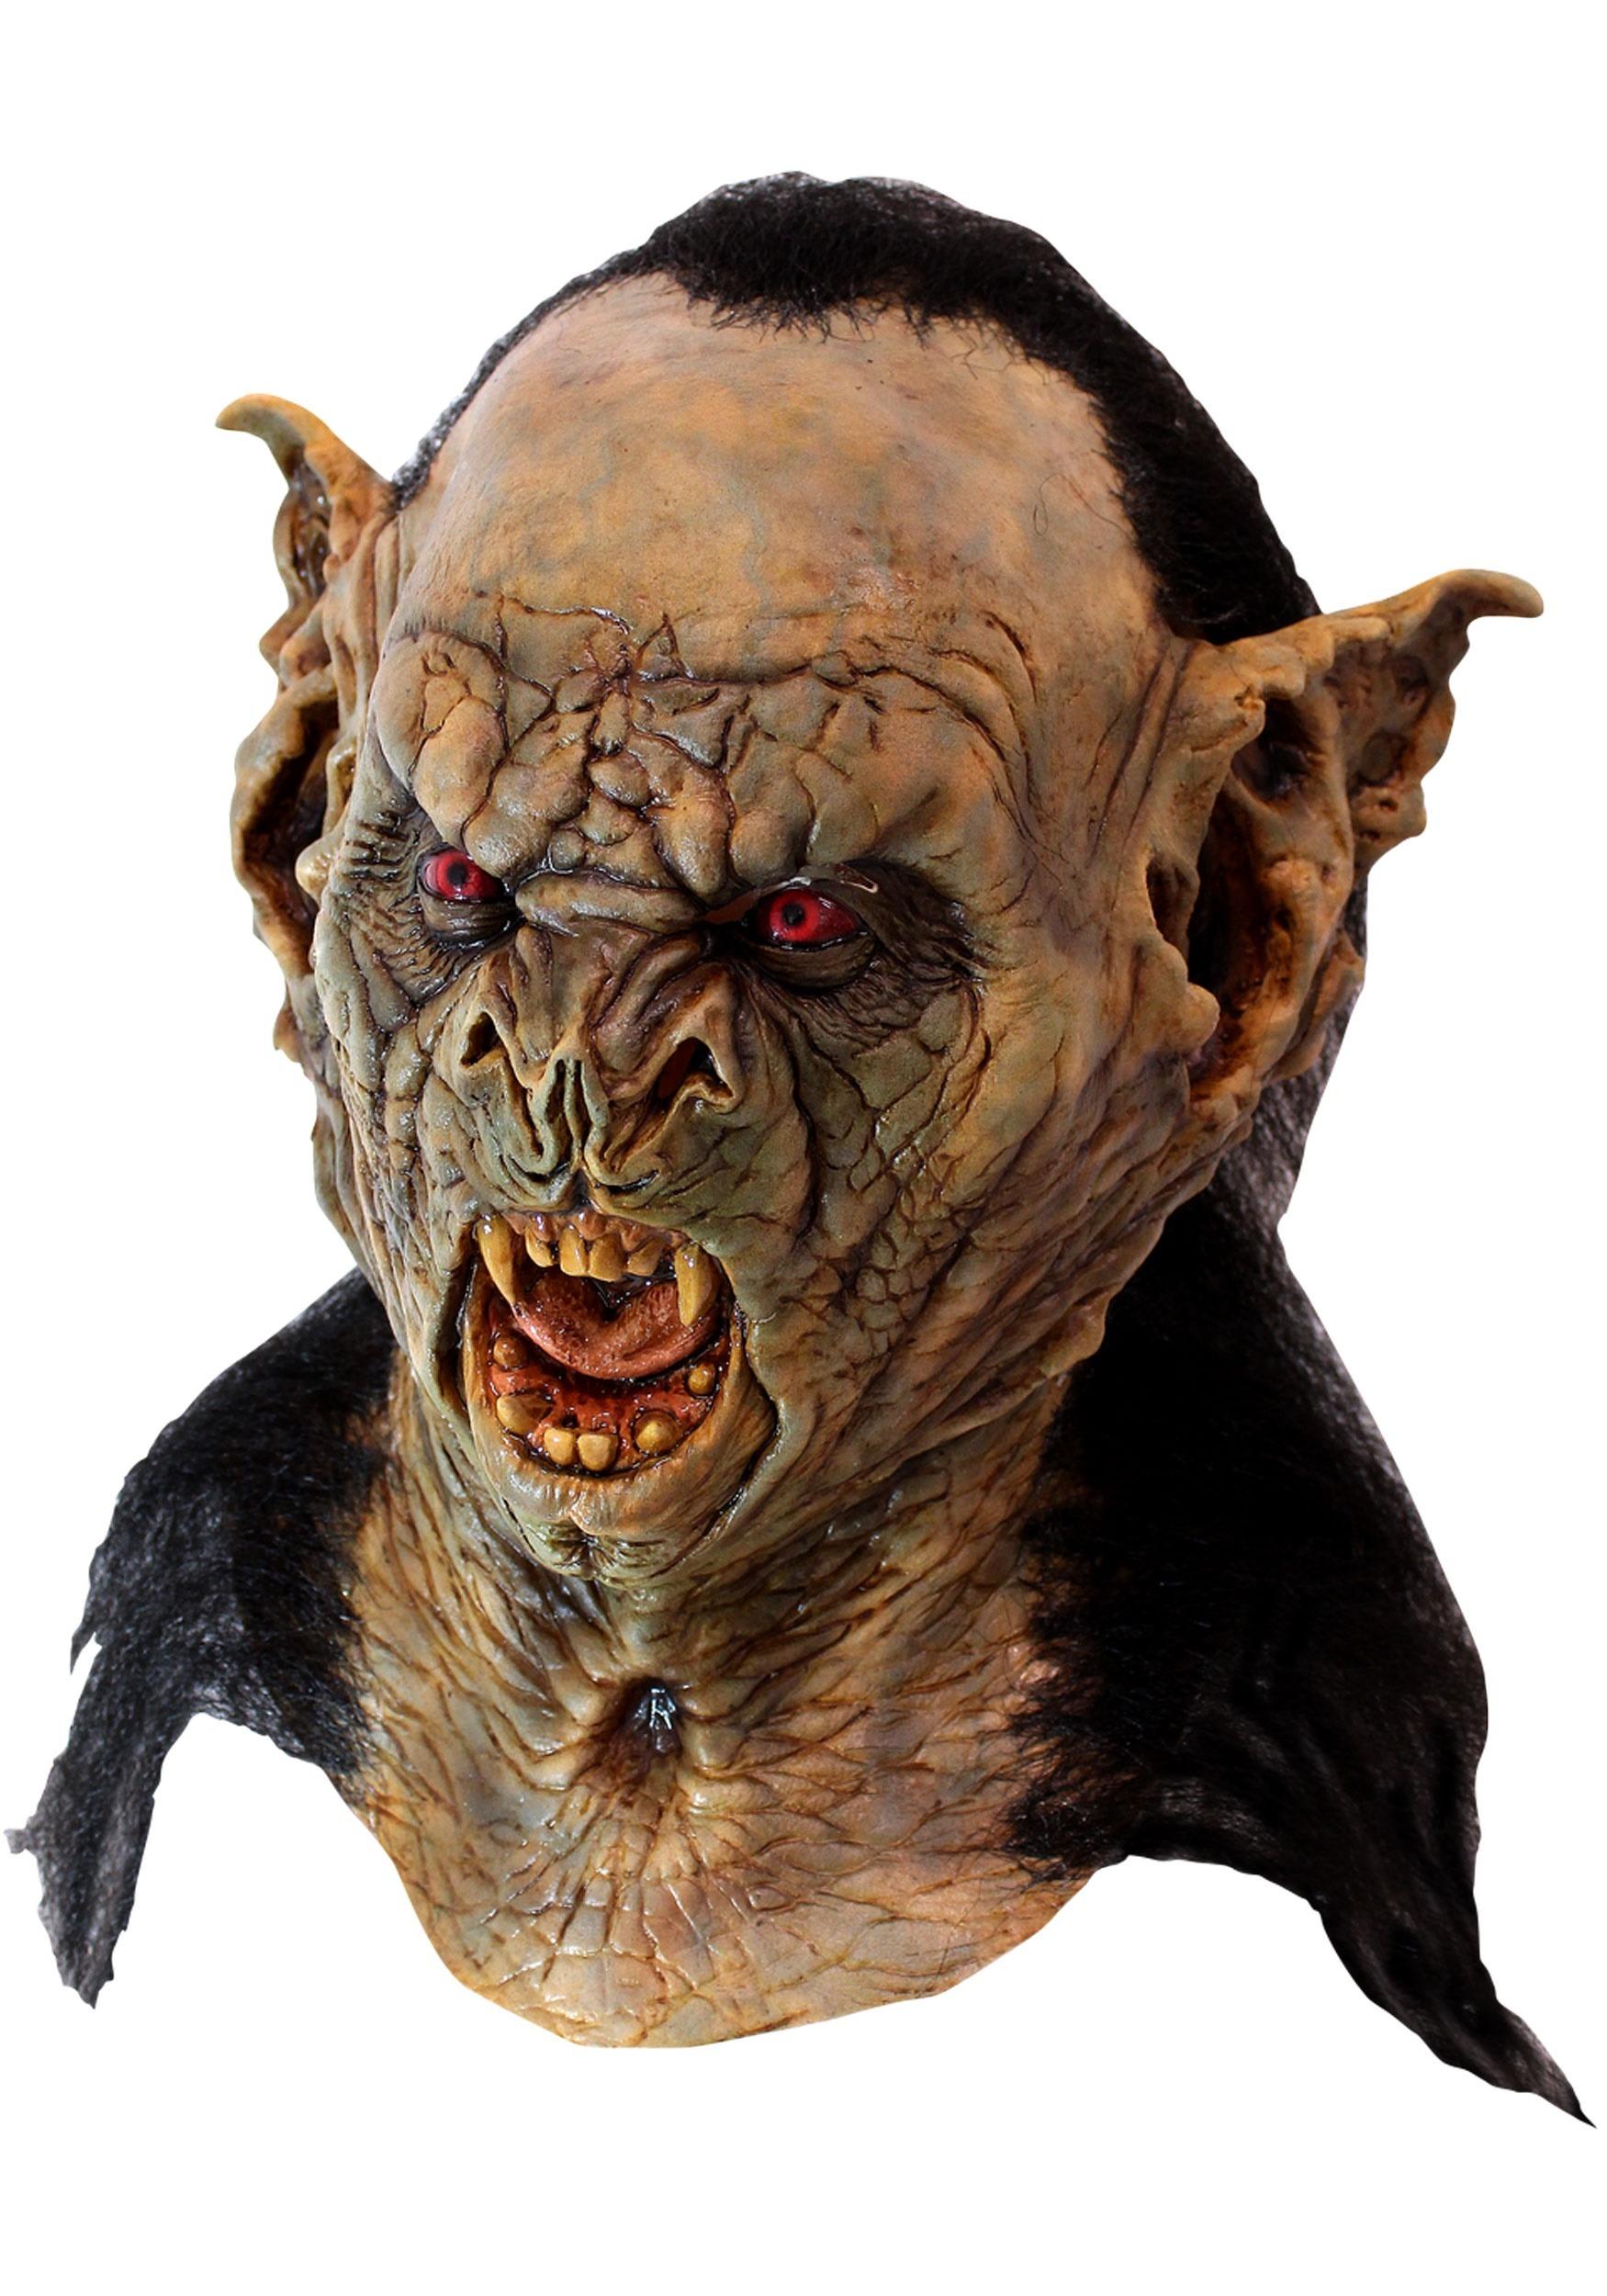 912357b39f7 Bram Stoker's Dracula Bat Mask